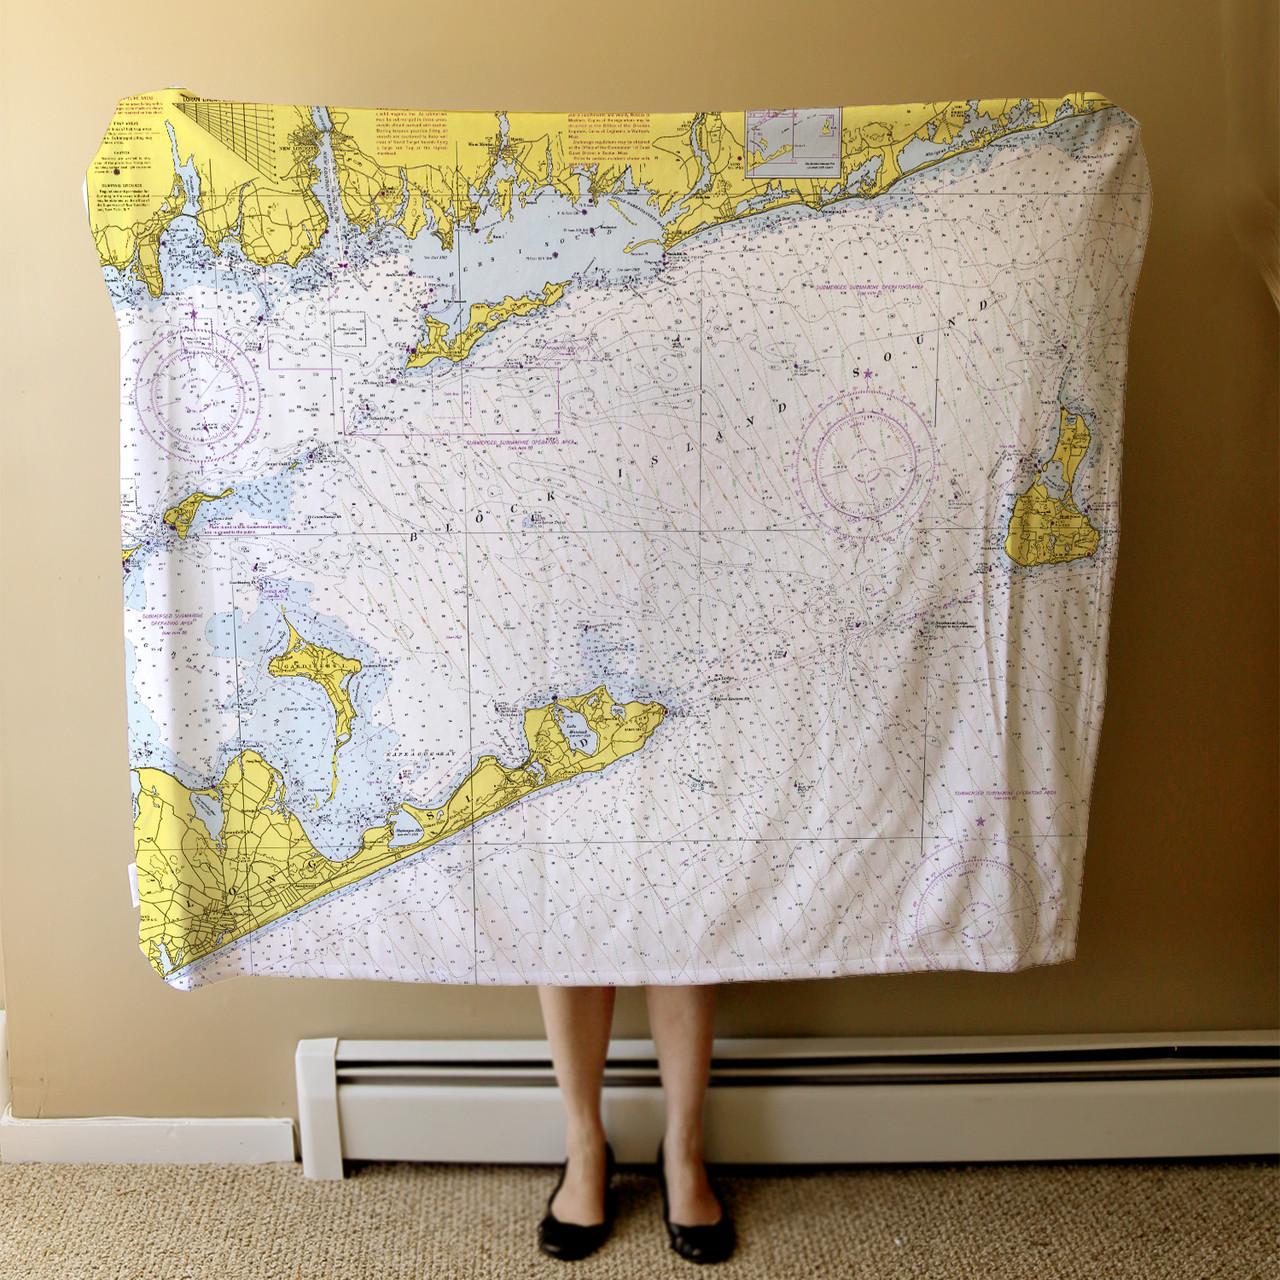 Block Island Sound, CT/RI #1 (MSF-B-008)